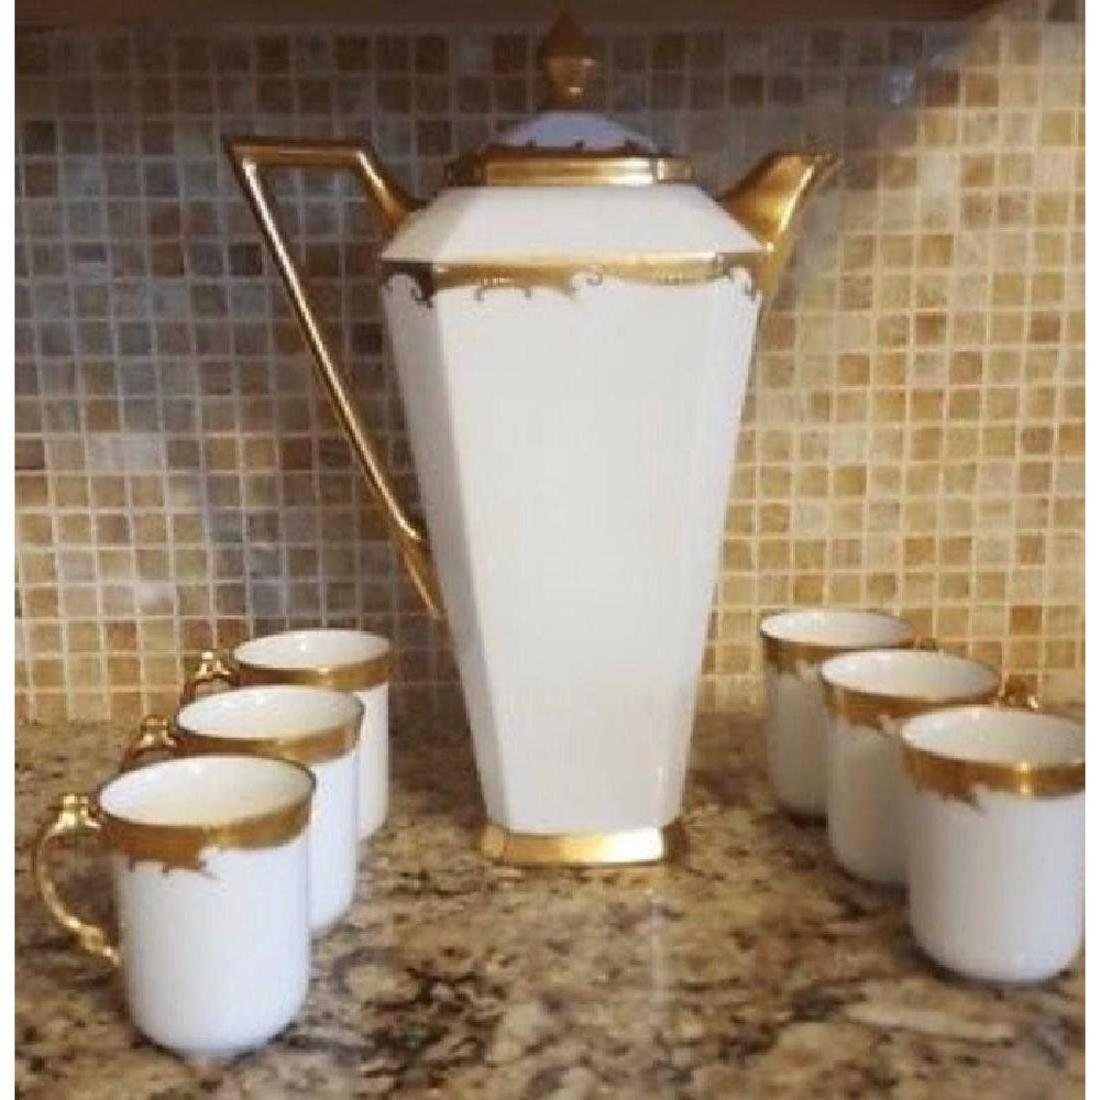 Antique Limoges France porcelain Chocolate Pot with